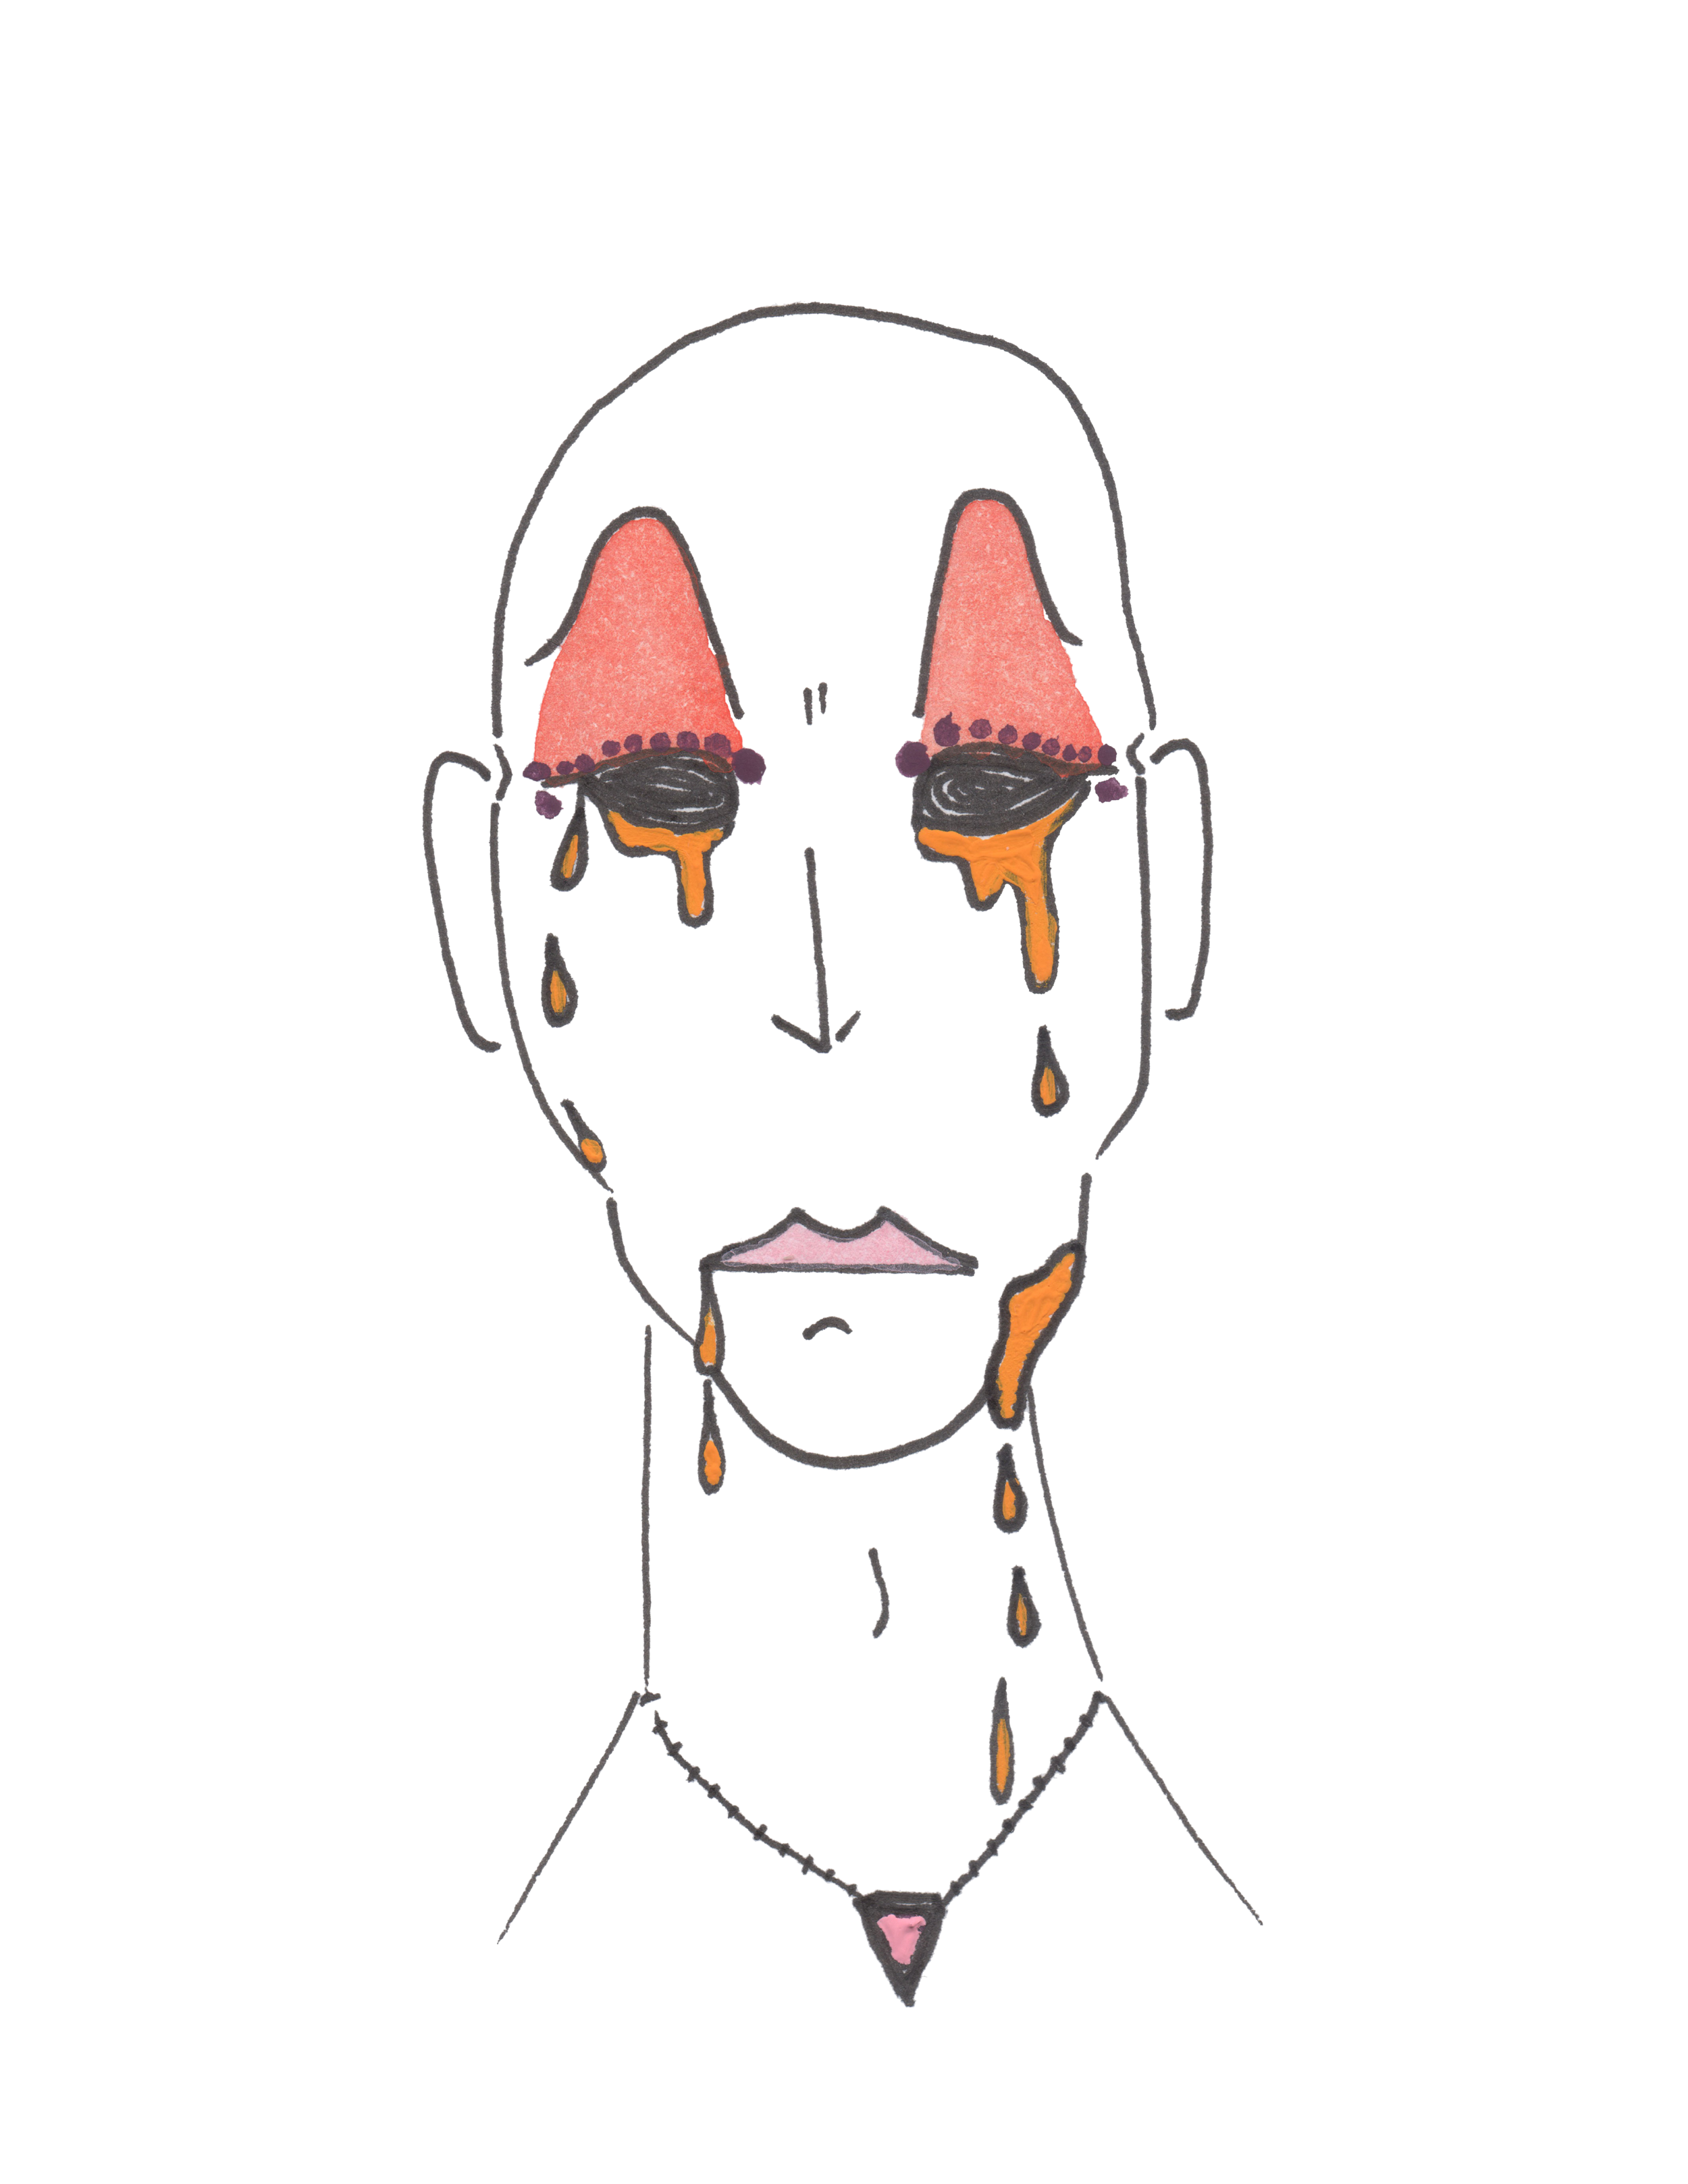 Face - 1 Edit 3.png